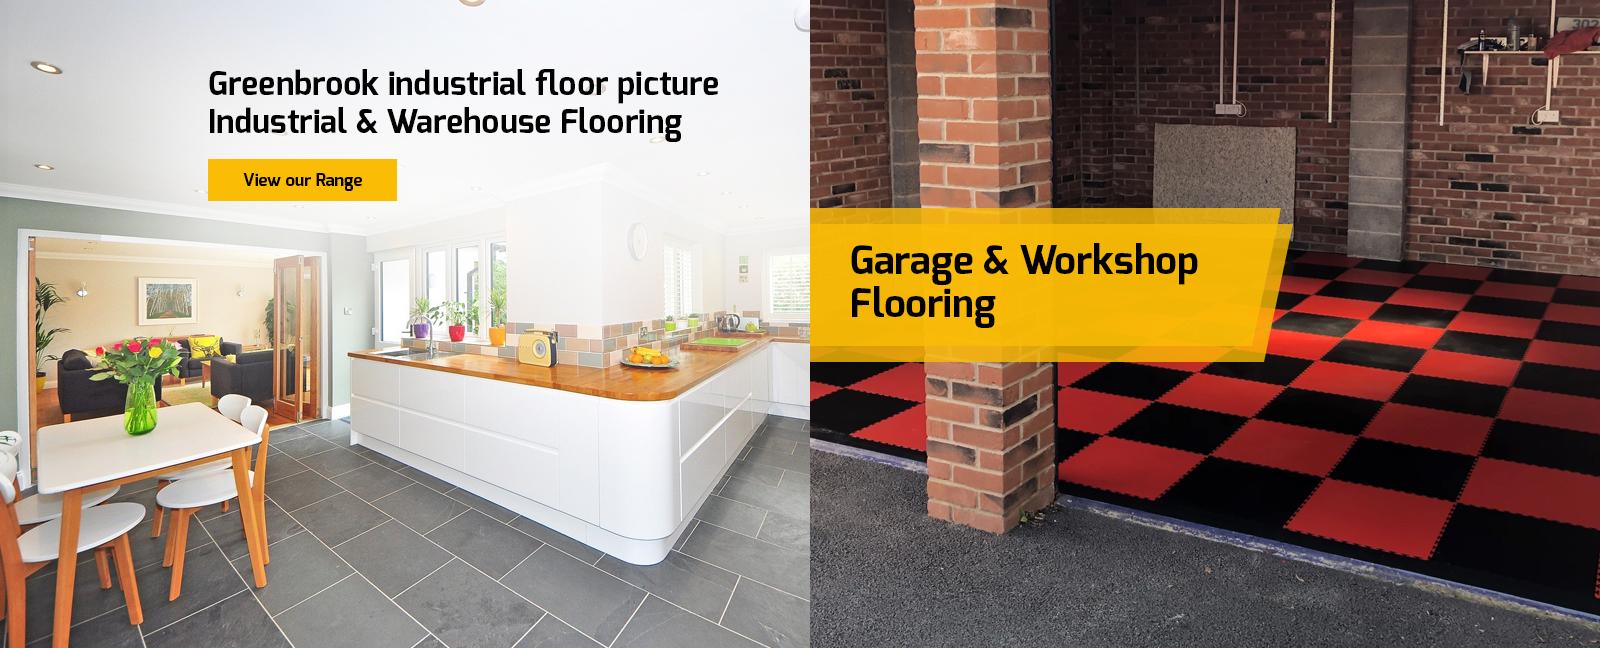 Wiz Floor Systems Interlocking Floor Tiles Anti Fatigue Mats